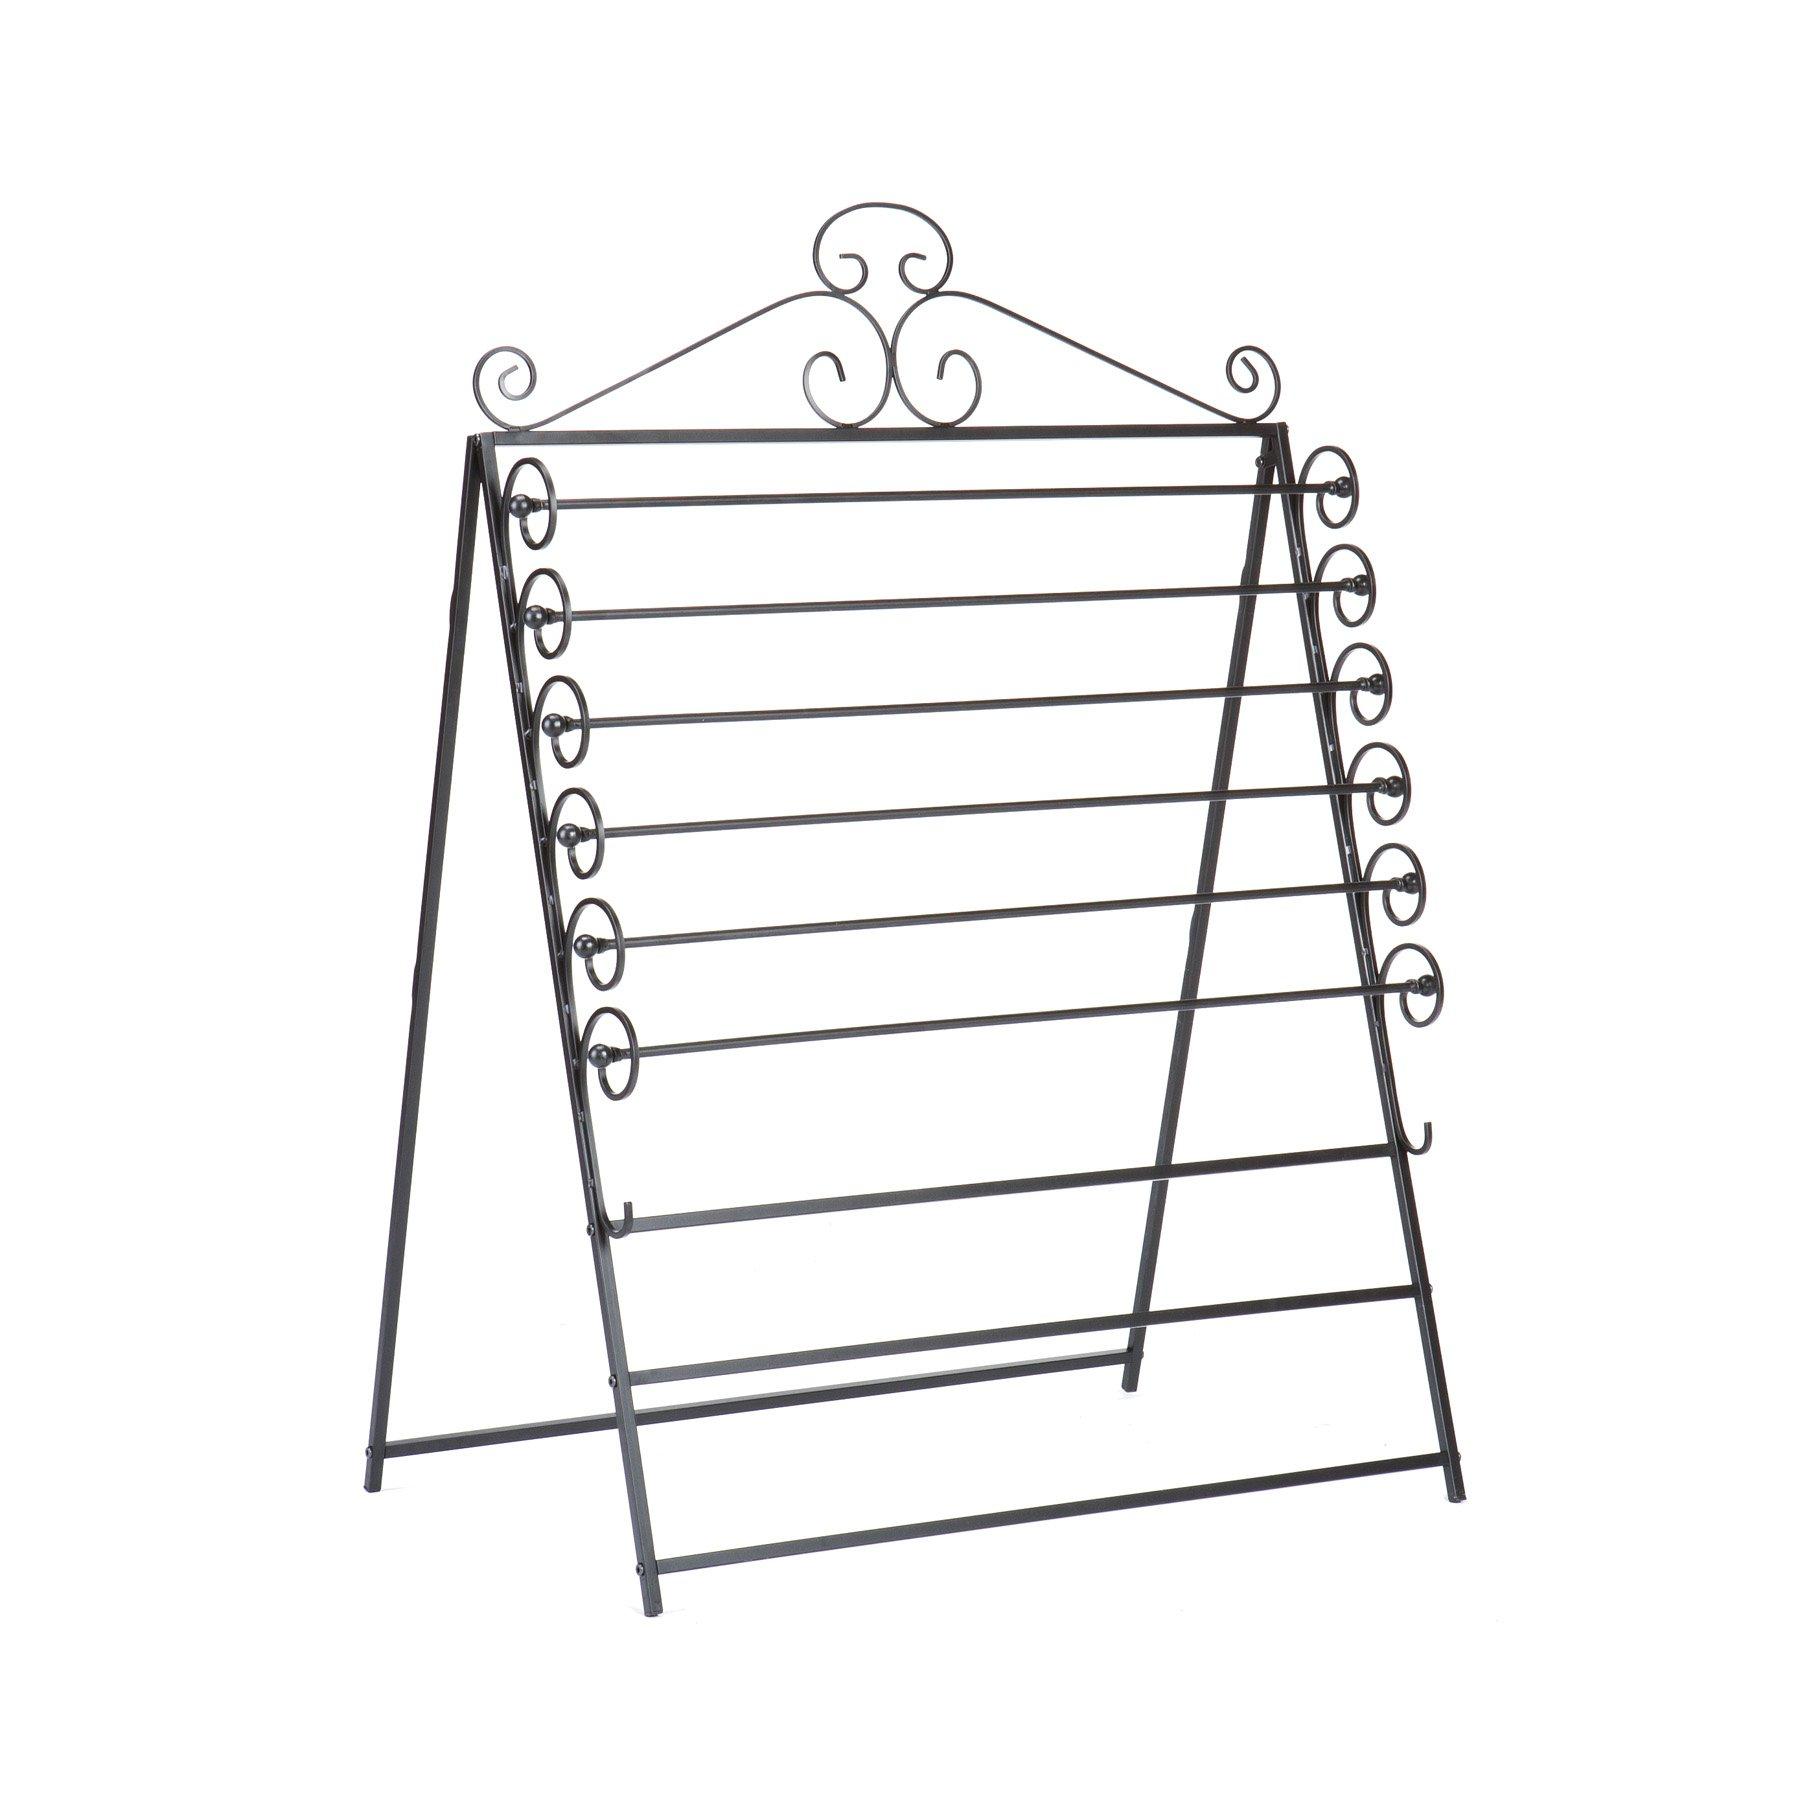 Southern Enterprises Easel/Wall Mount Craft Storage Rack, Black Finish